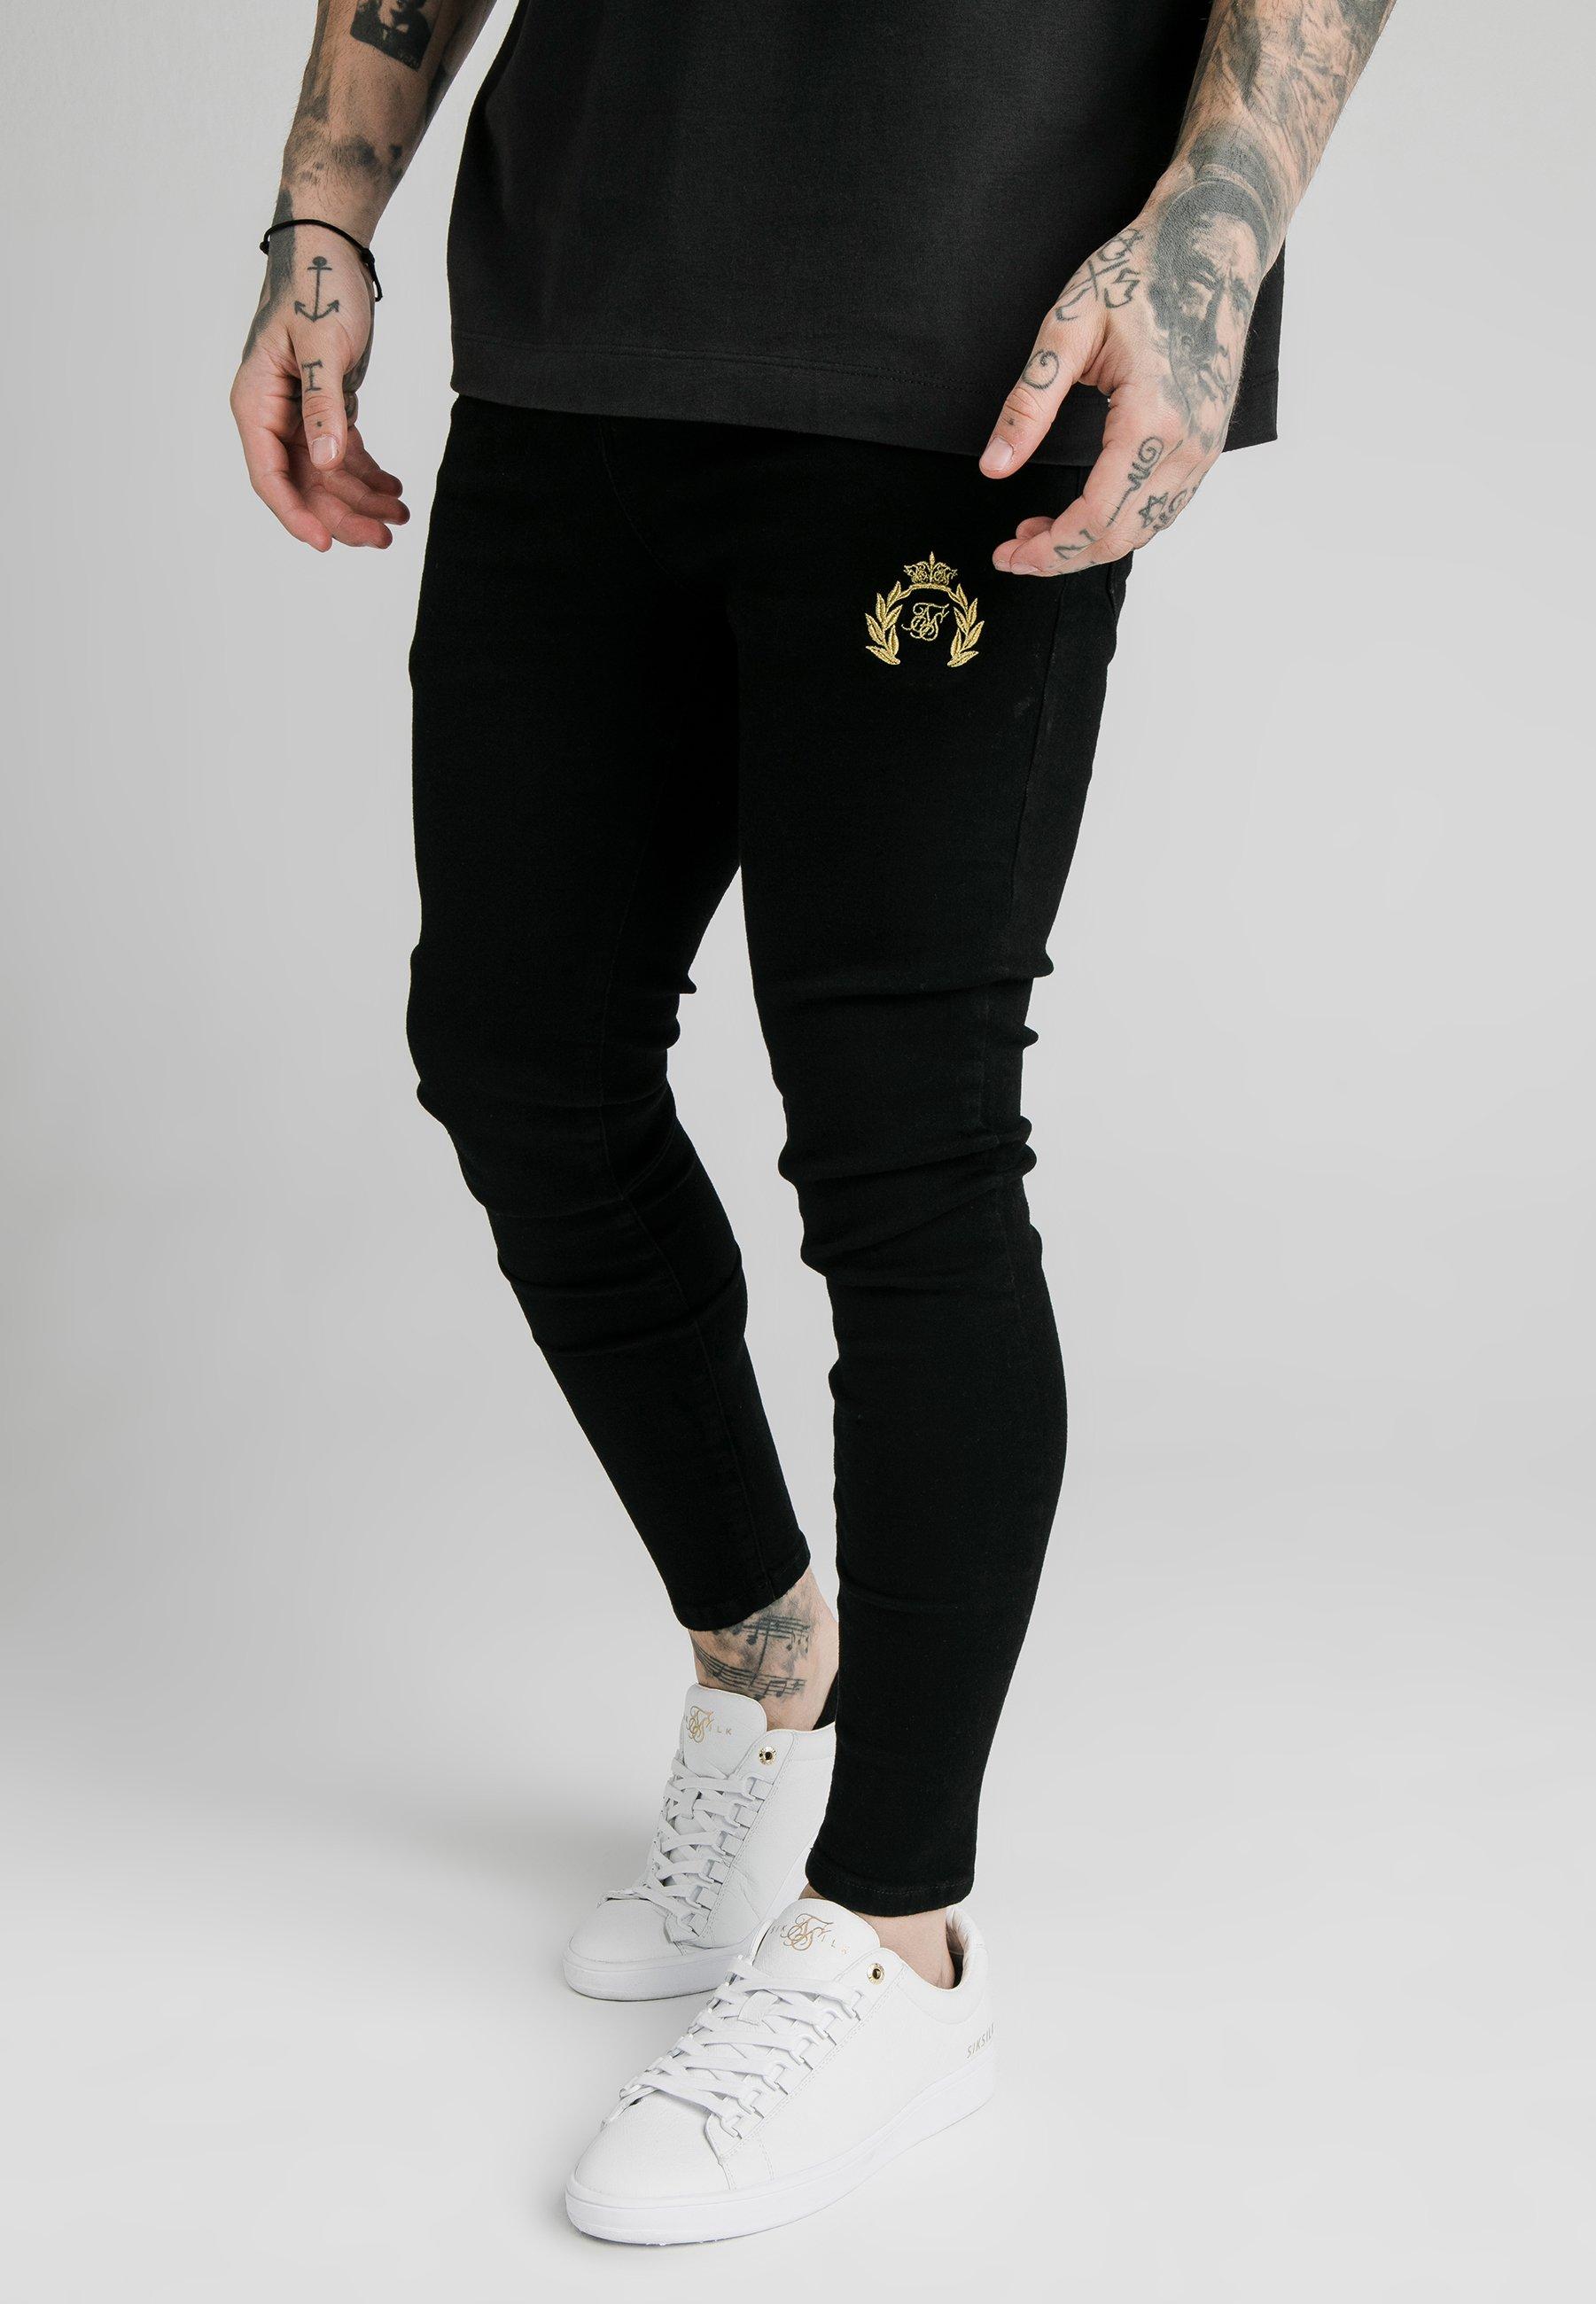 Classique Vêtements homme SIKSILK DISTRESSED PRESTIGE SKINNY  Jeans Skinny black i18gv9us